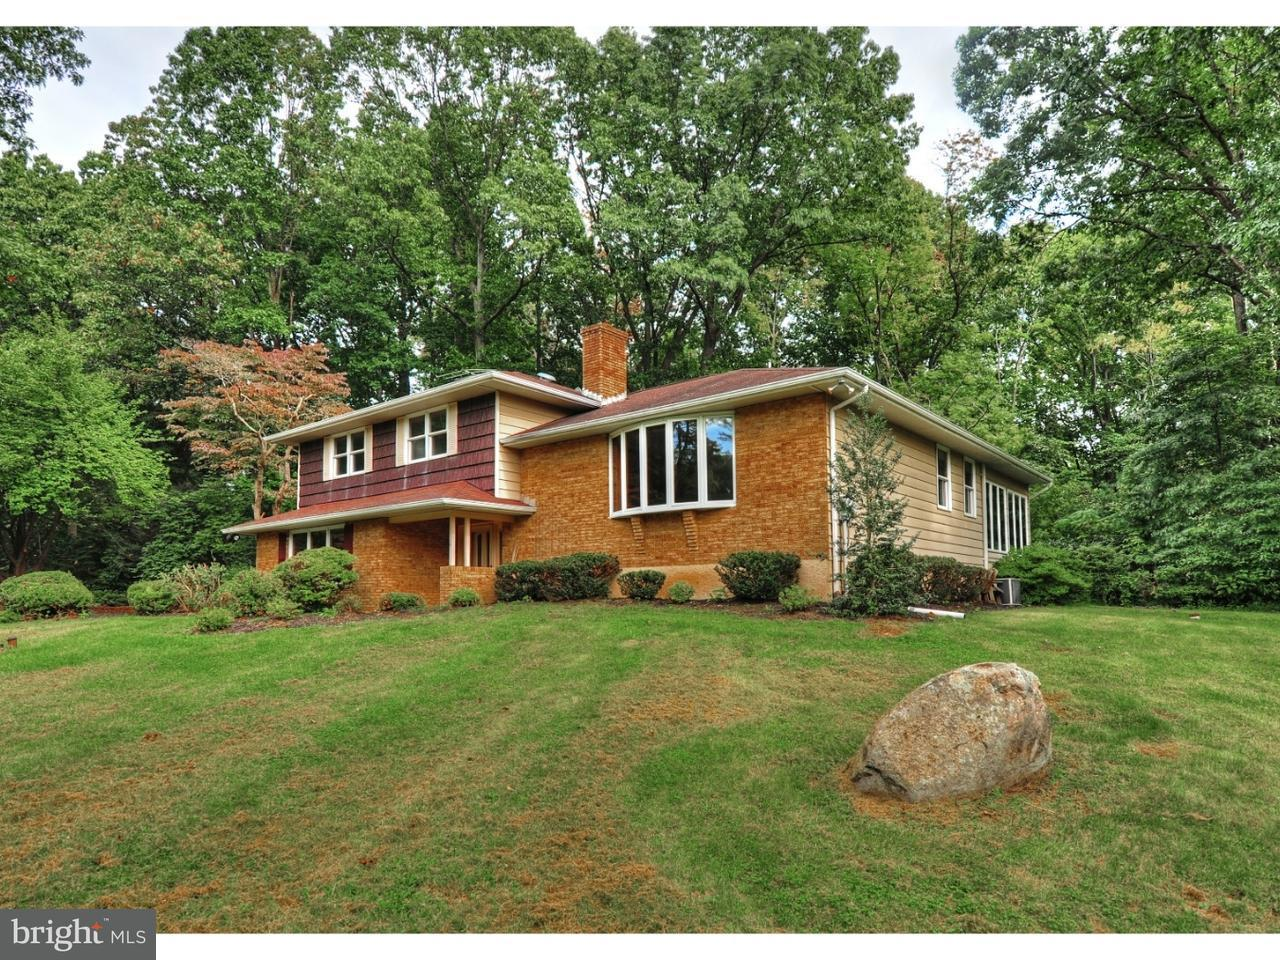 Single Family Home for Sale at 132 STEINMETZ Road Limerick, Pennsylvania 19473 United States